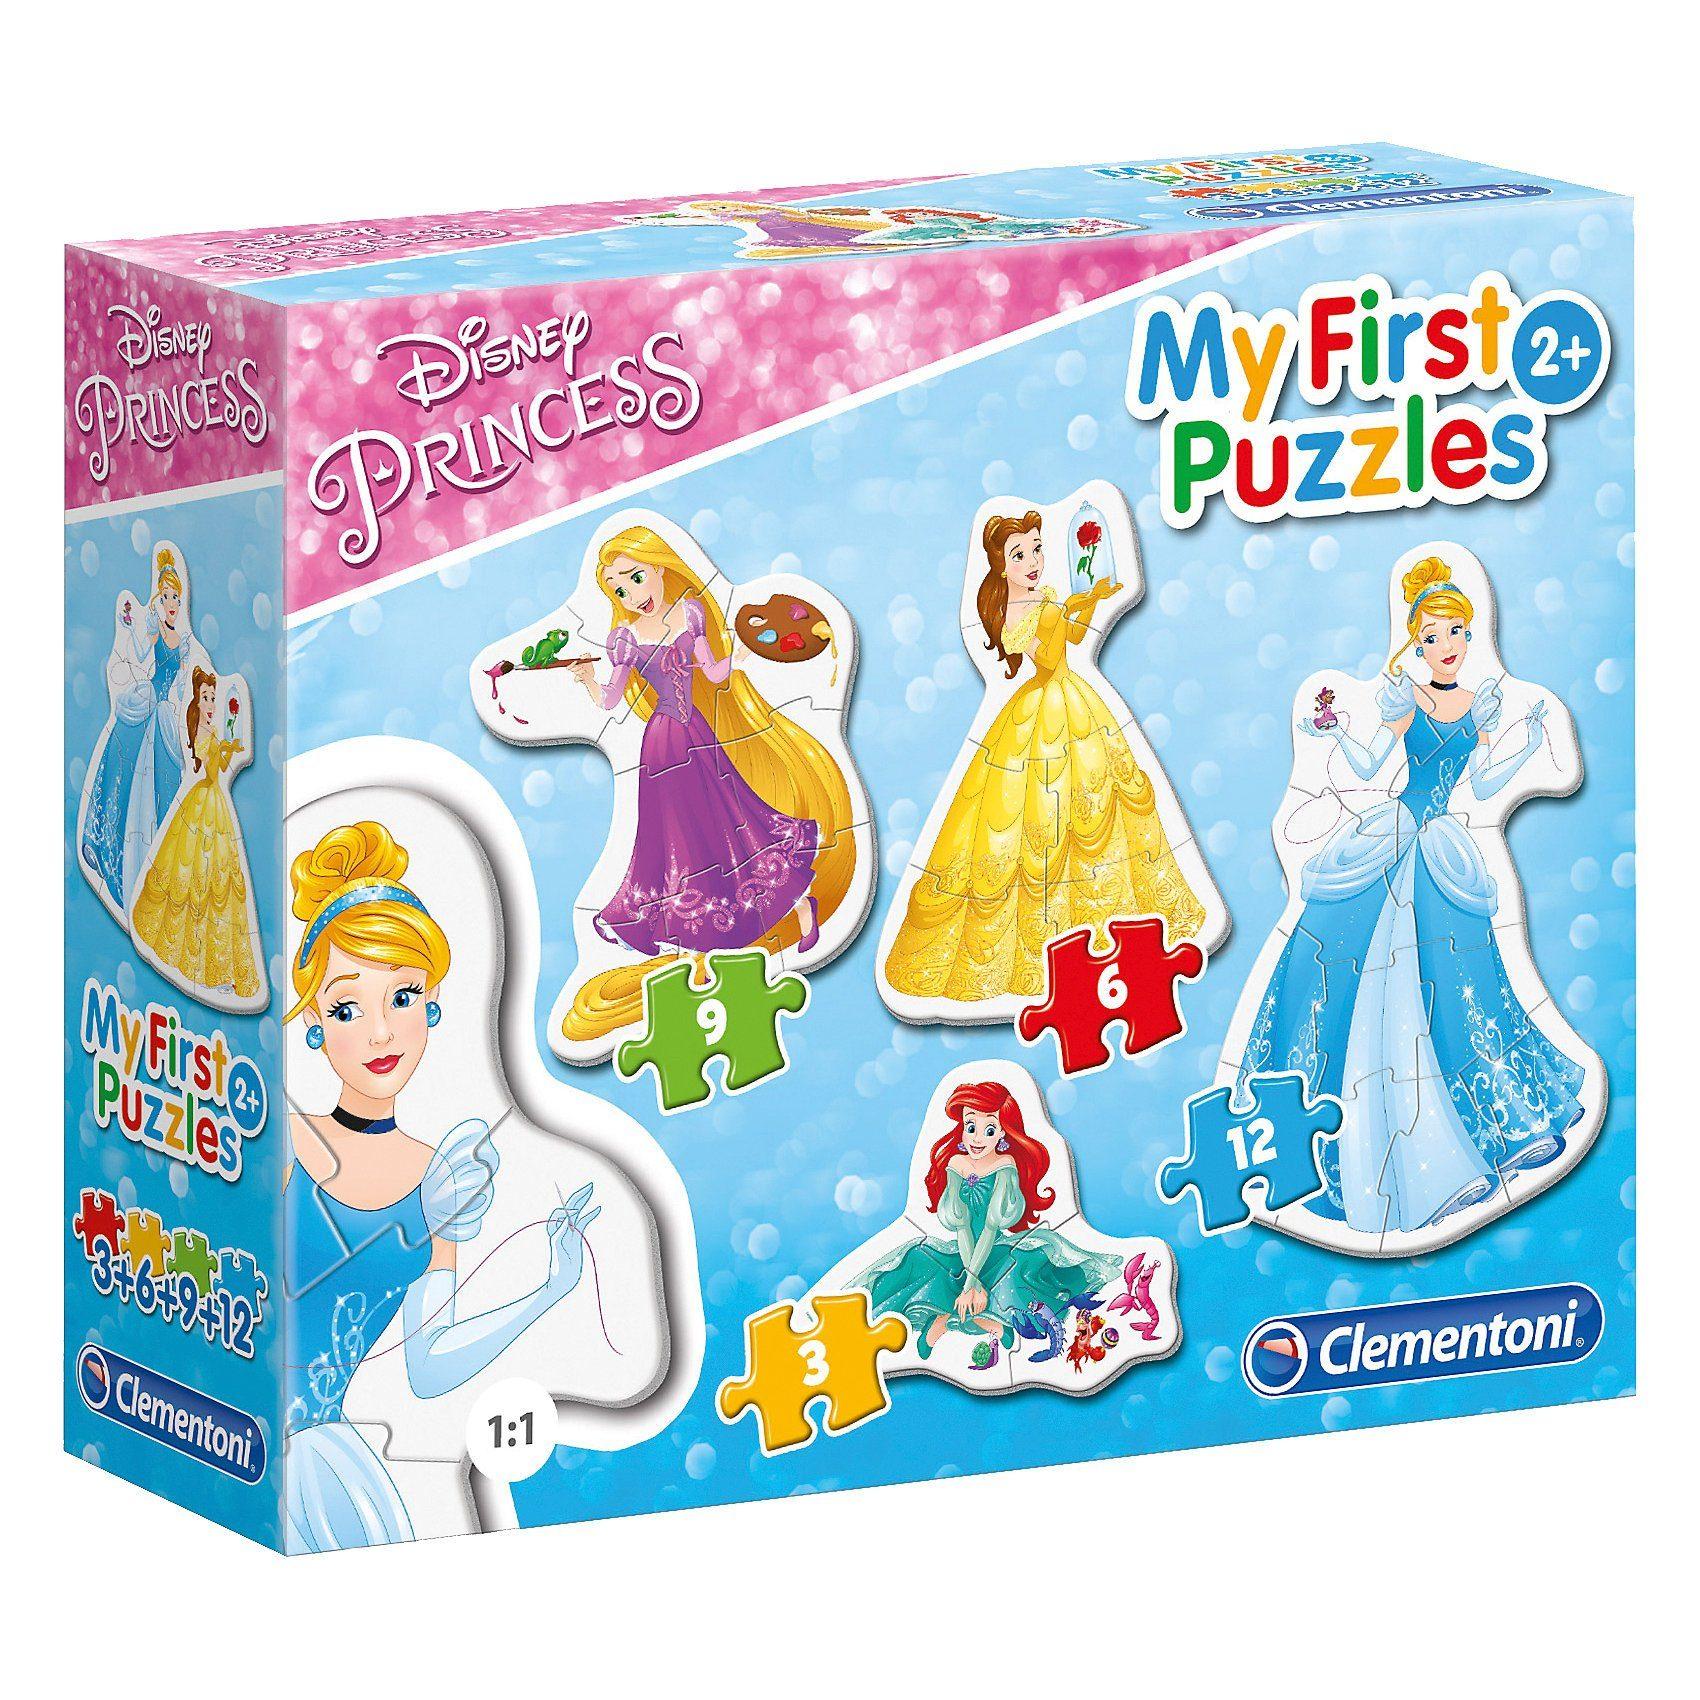 Clementoni® My first Puzzles - Disney Princess